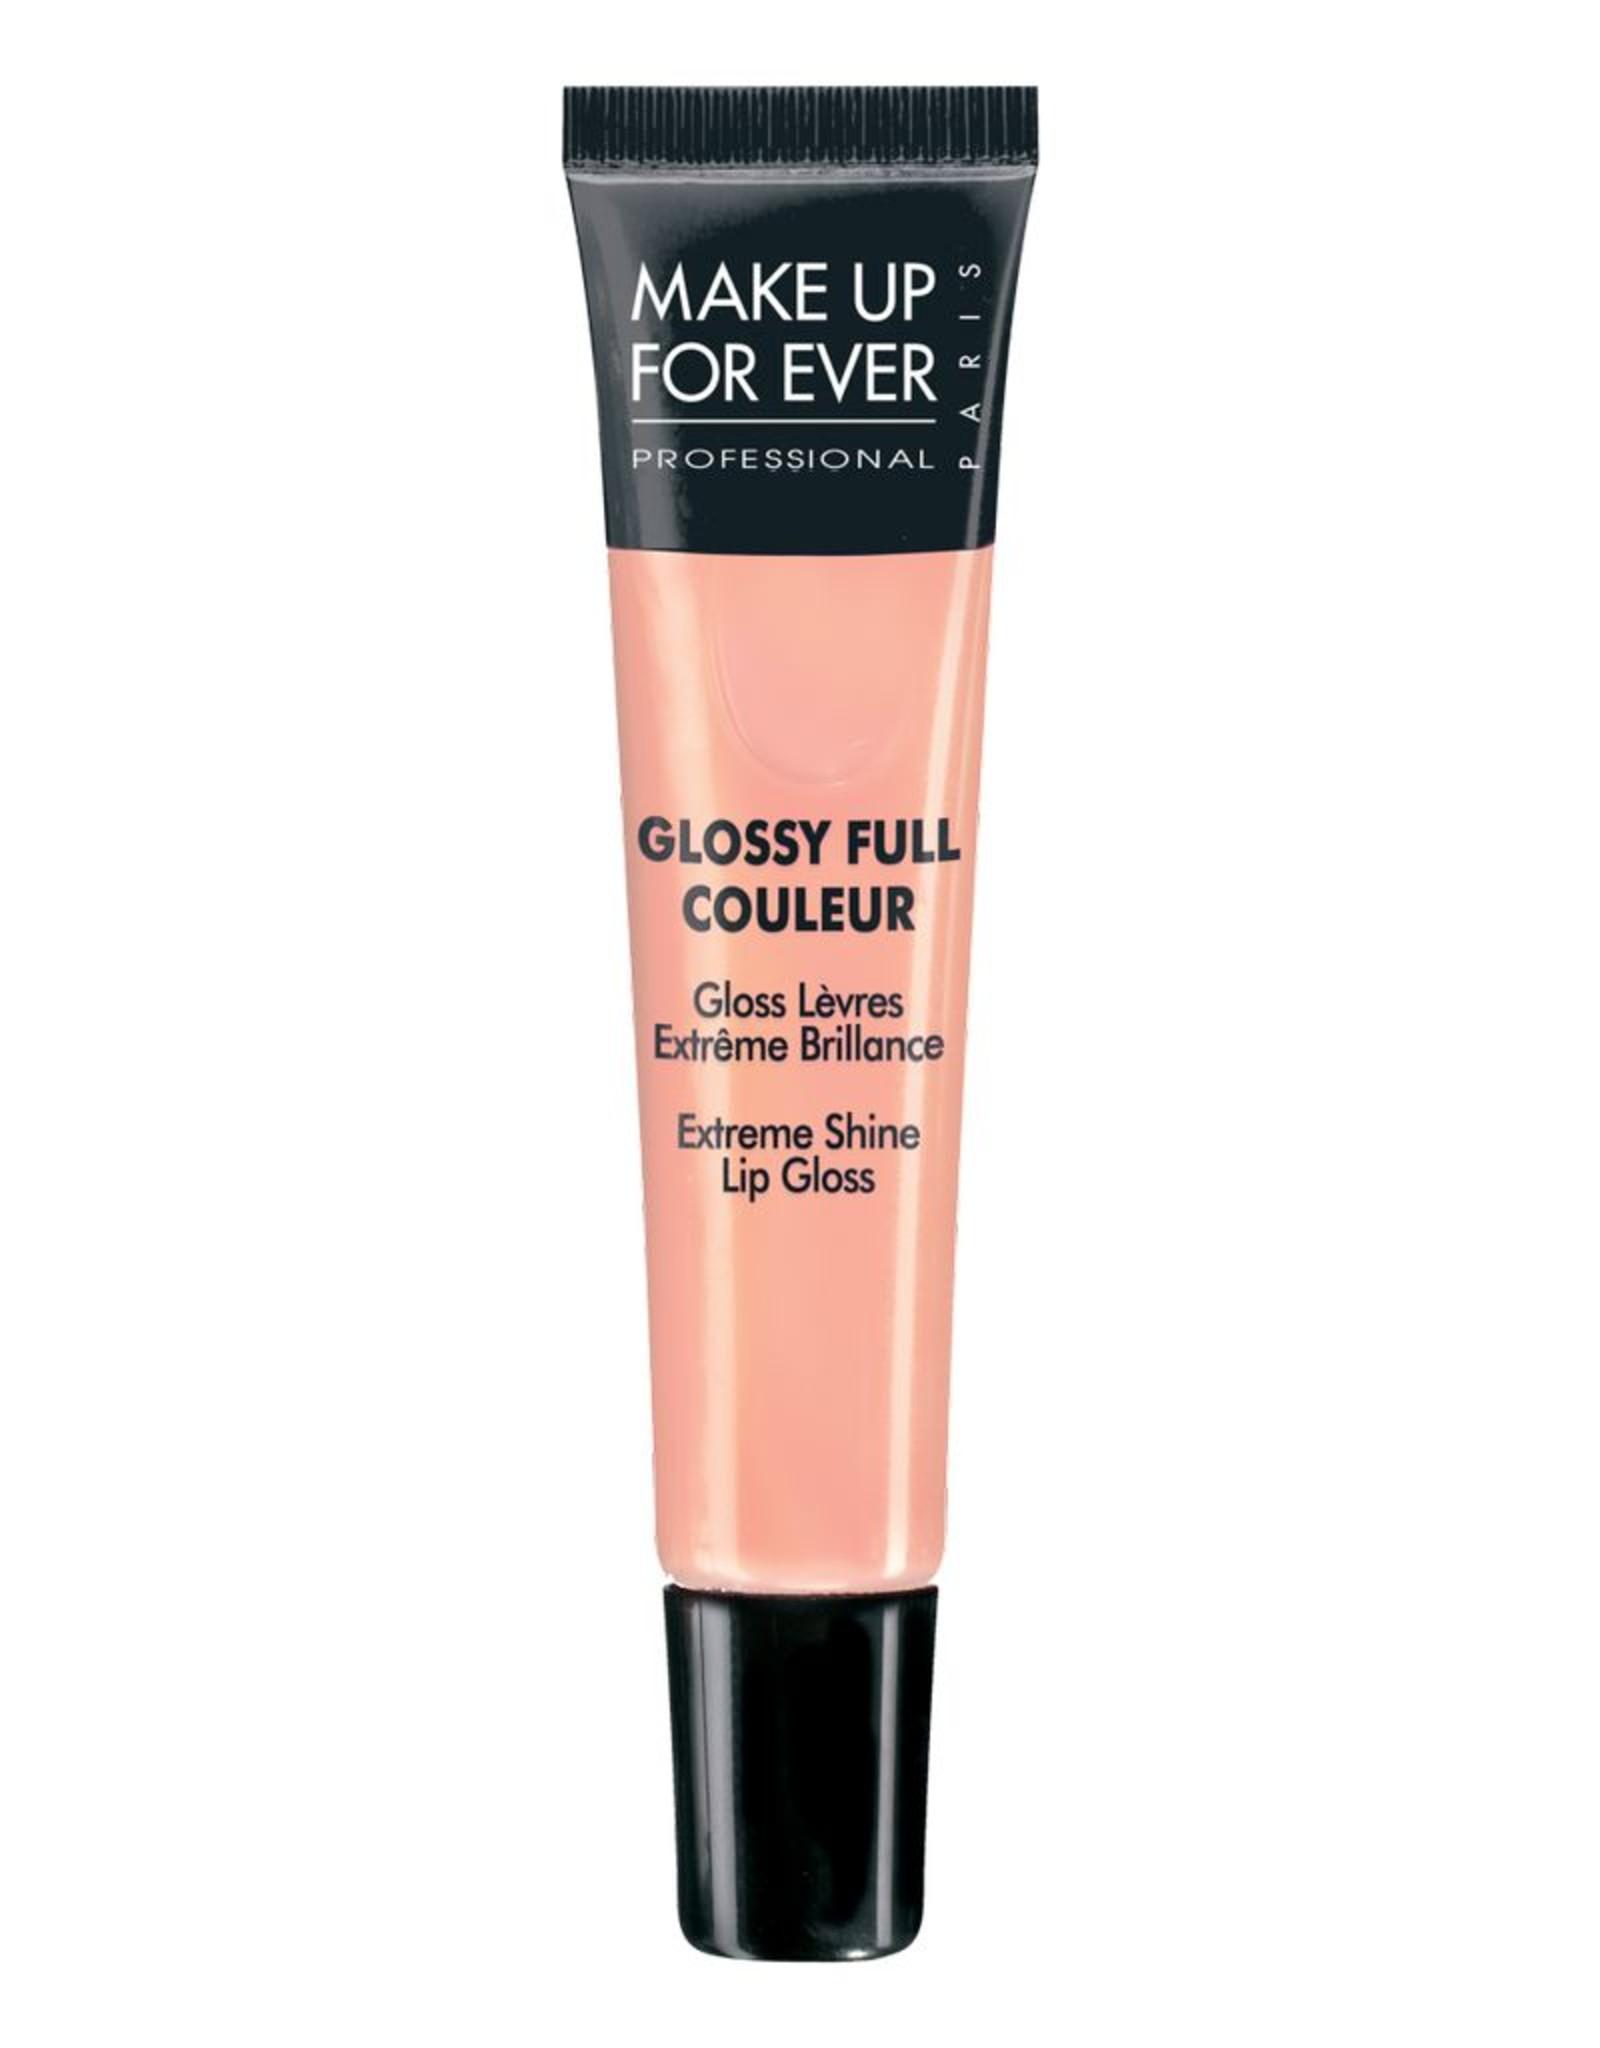 MUFE GLOSSY FULL COULEUR 10mlN6 rose profond  /  deep rose